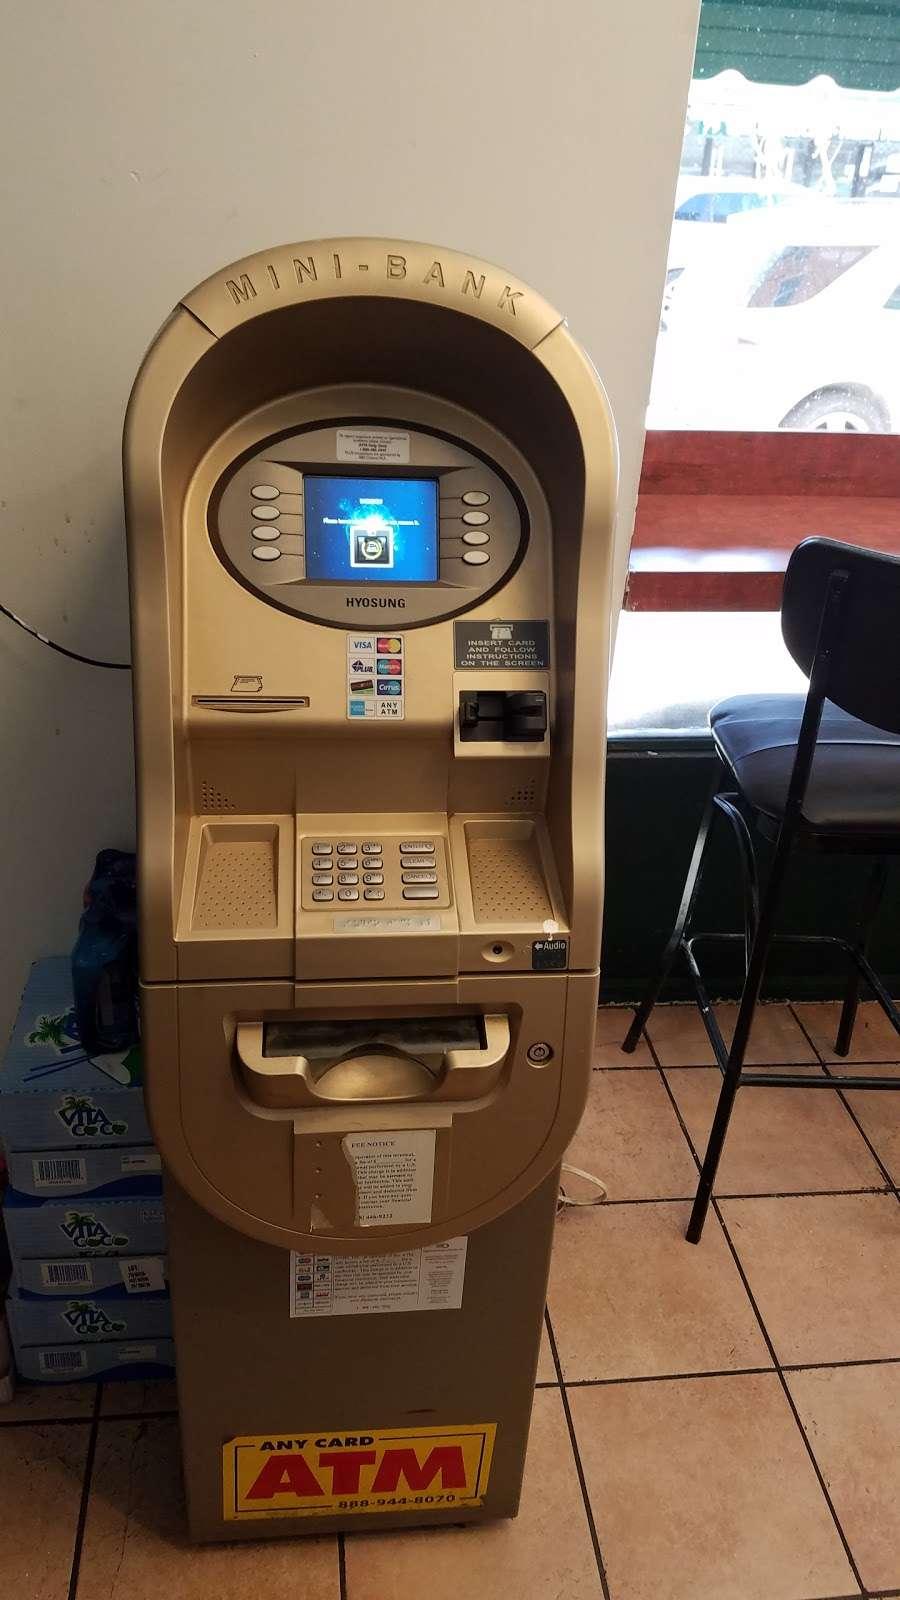 Anycard ATM - atm  | Photo 3 of 3 | Address: 84 Henry St, Brooklyn, NY 11201, USA